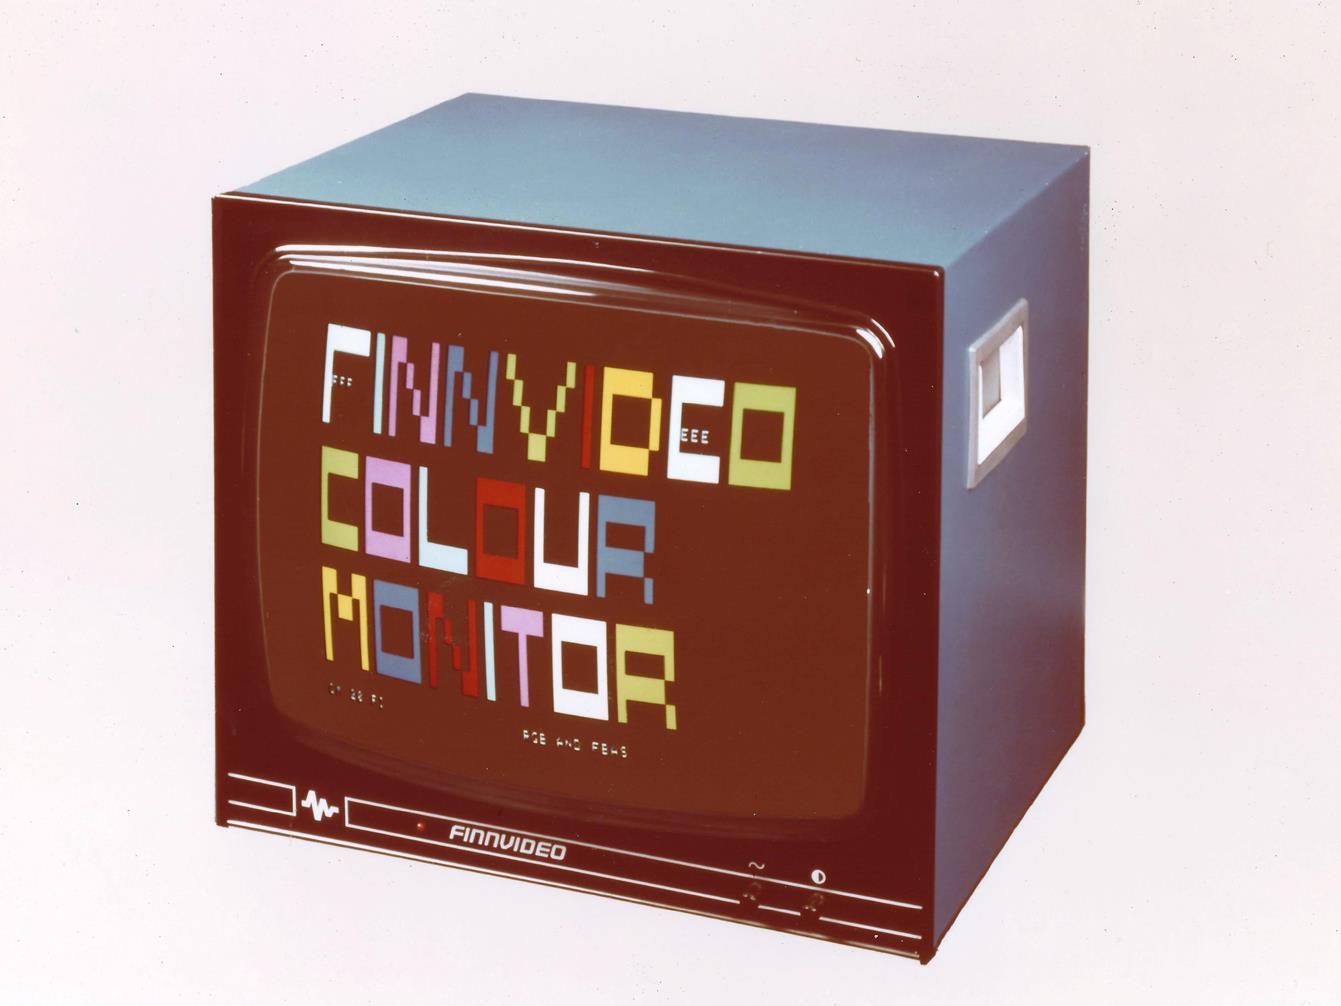 Videomonitori_Finnvideo_RGB_20__kuva_vuodelta_1979_02.jpg